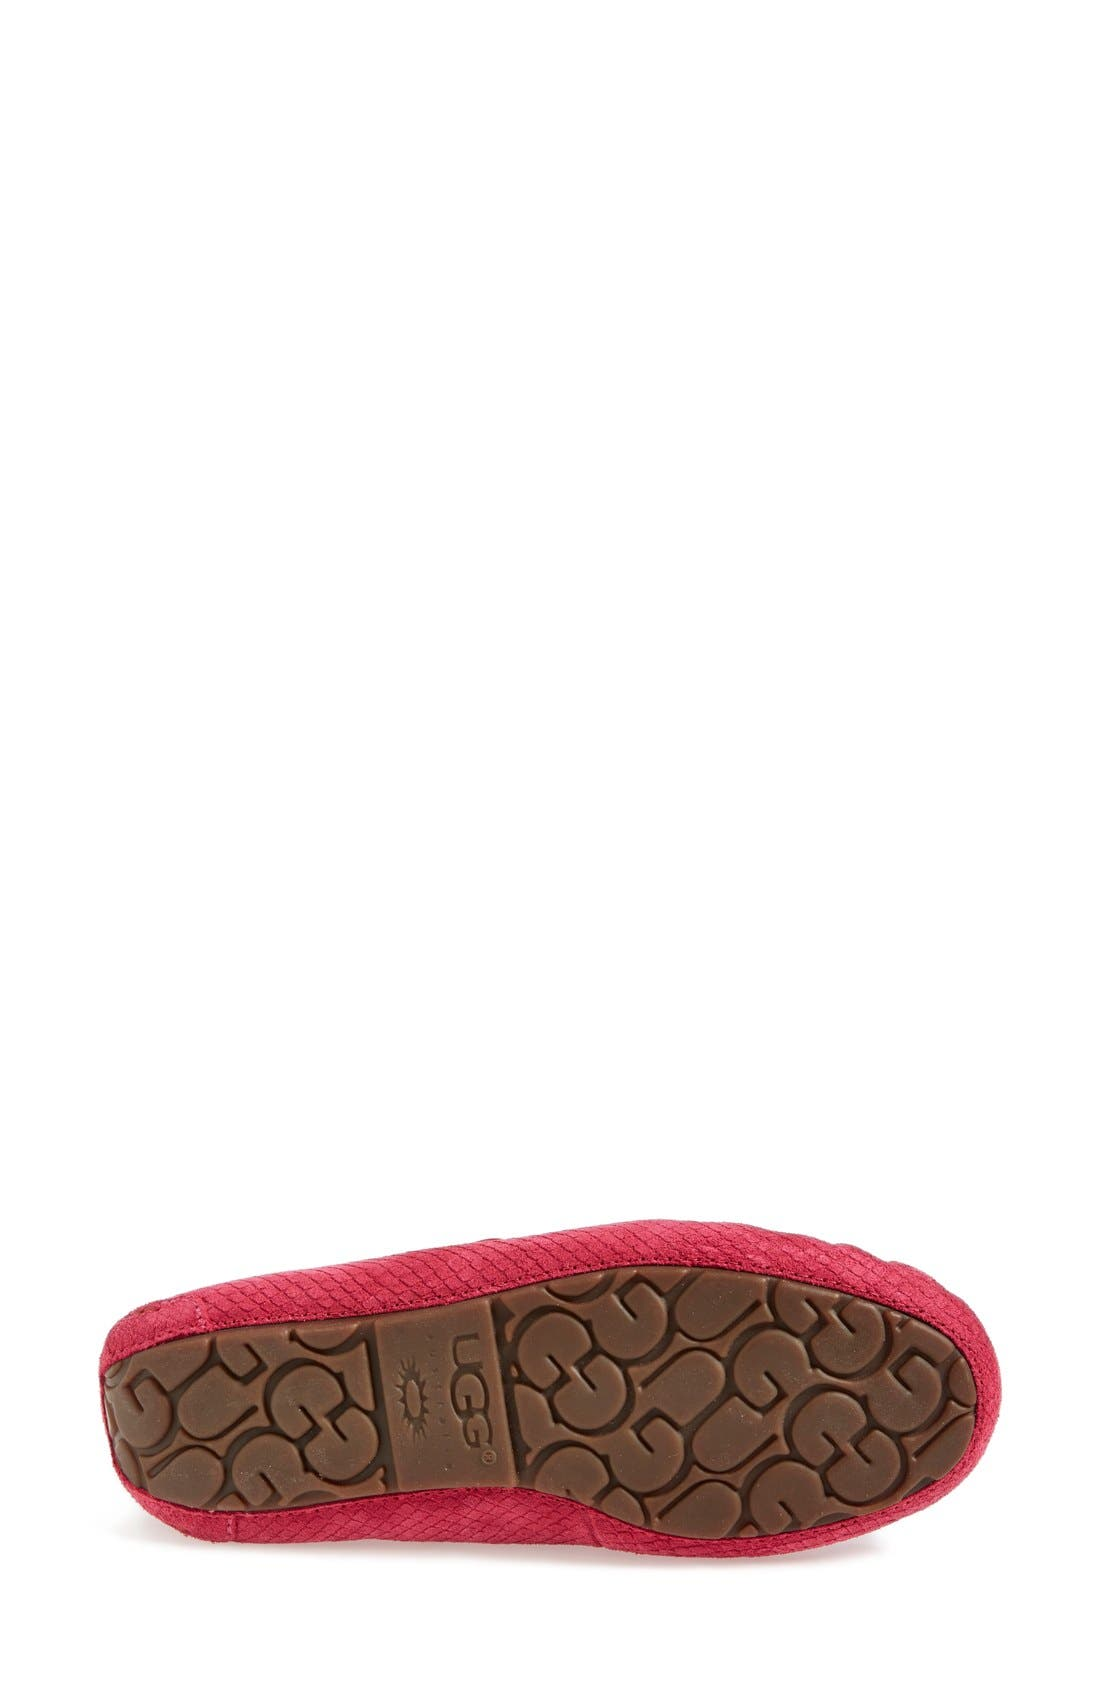 Alternate Image 4  - UGG® Australia 'Dakota - Exotic Scales' Suede Slipper (Women)